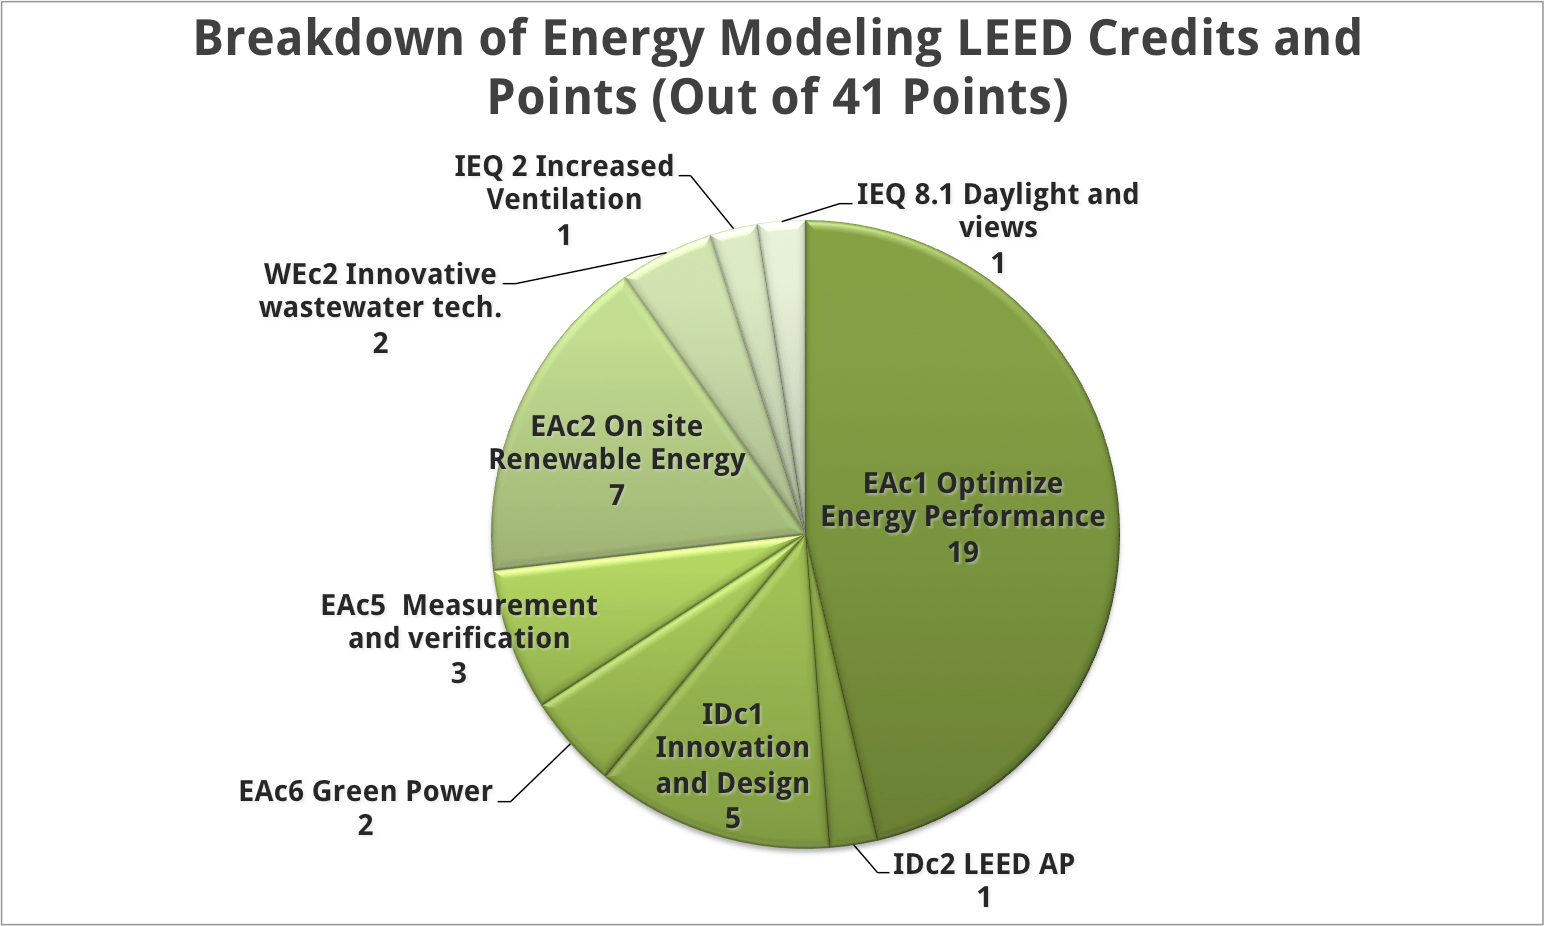 lutron 0 10v dimming wiring diagram 240 volt led light dimmer switch installation ~ elsalvadorla